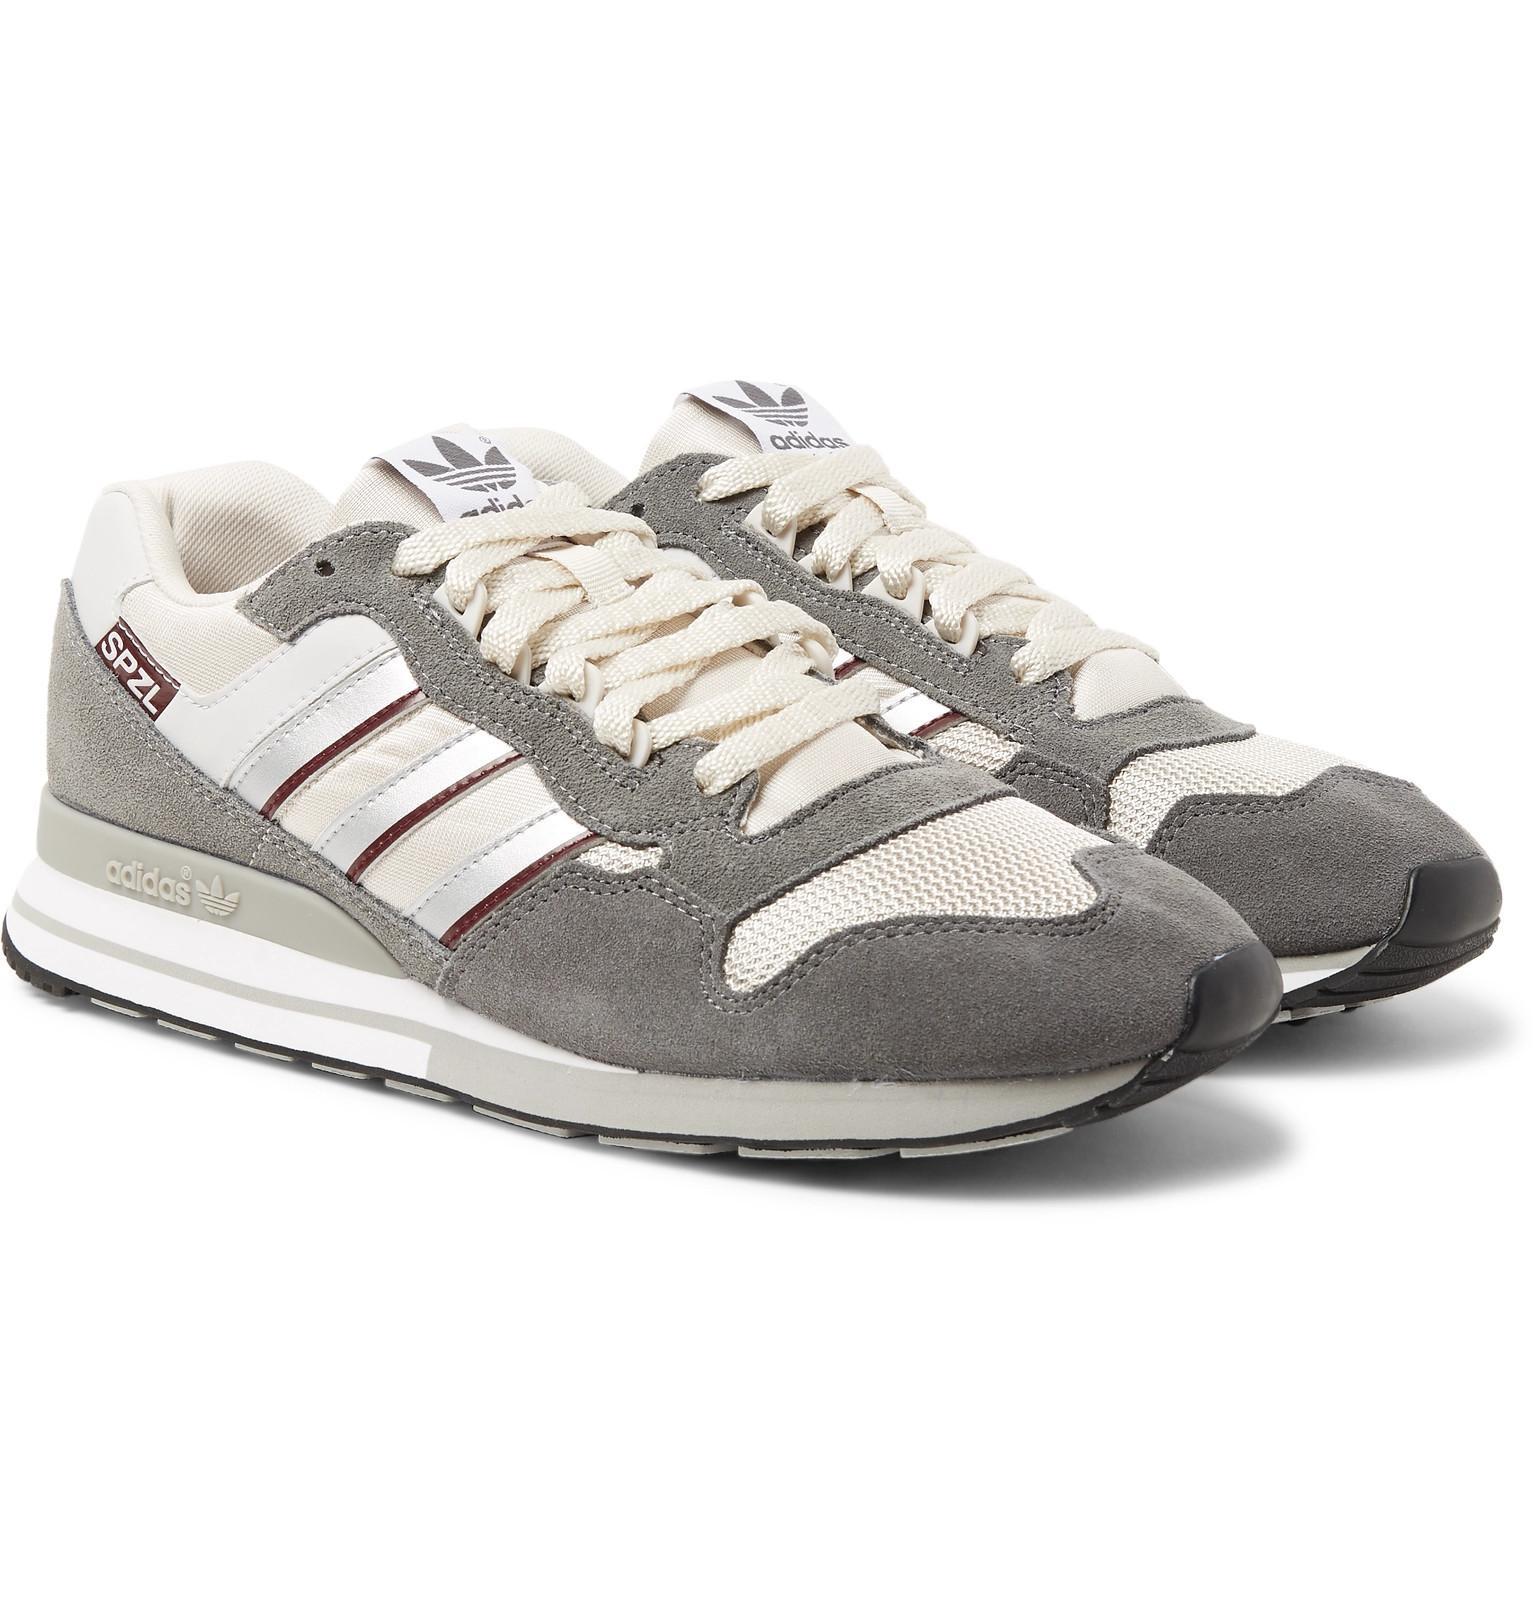 bfcced6bdec2 adidas Originals. Men s Gray Spezial ...